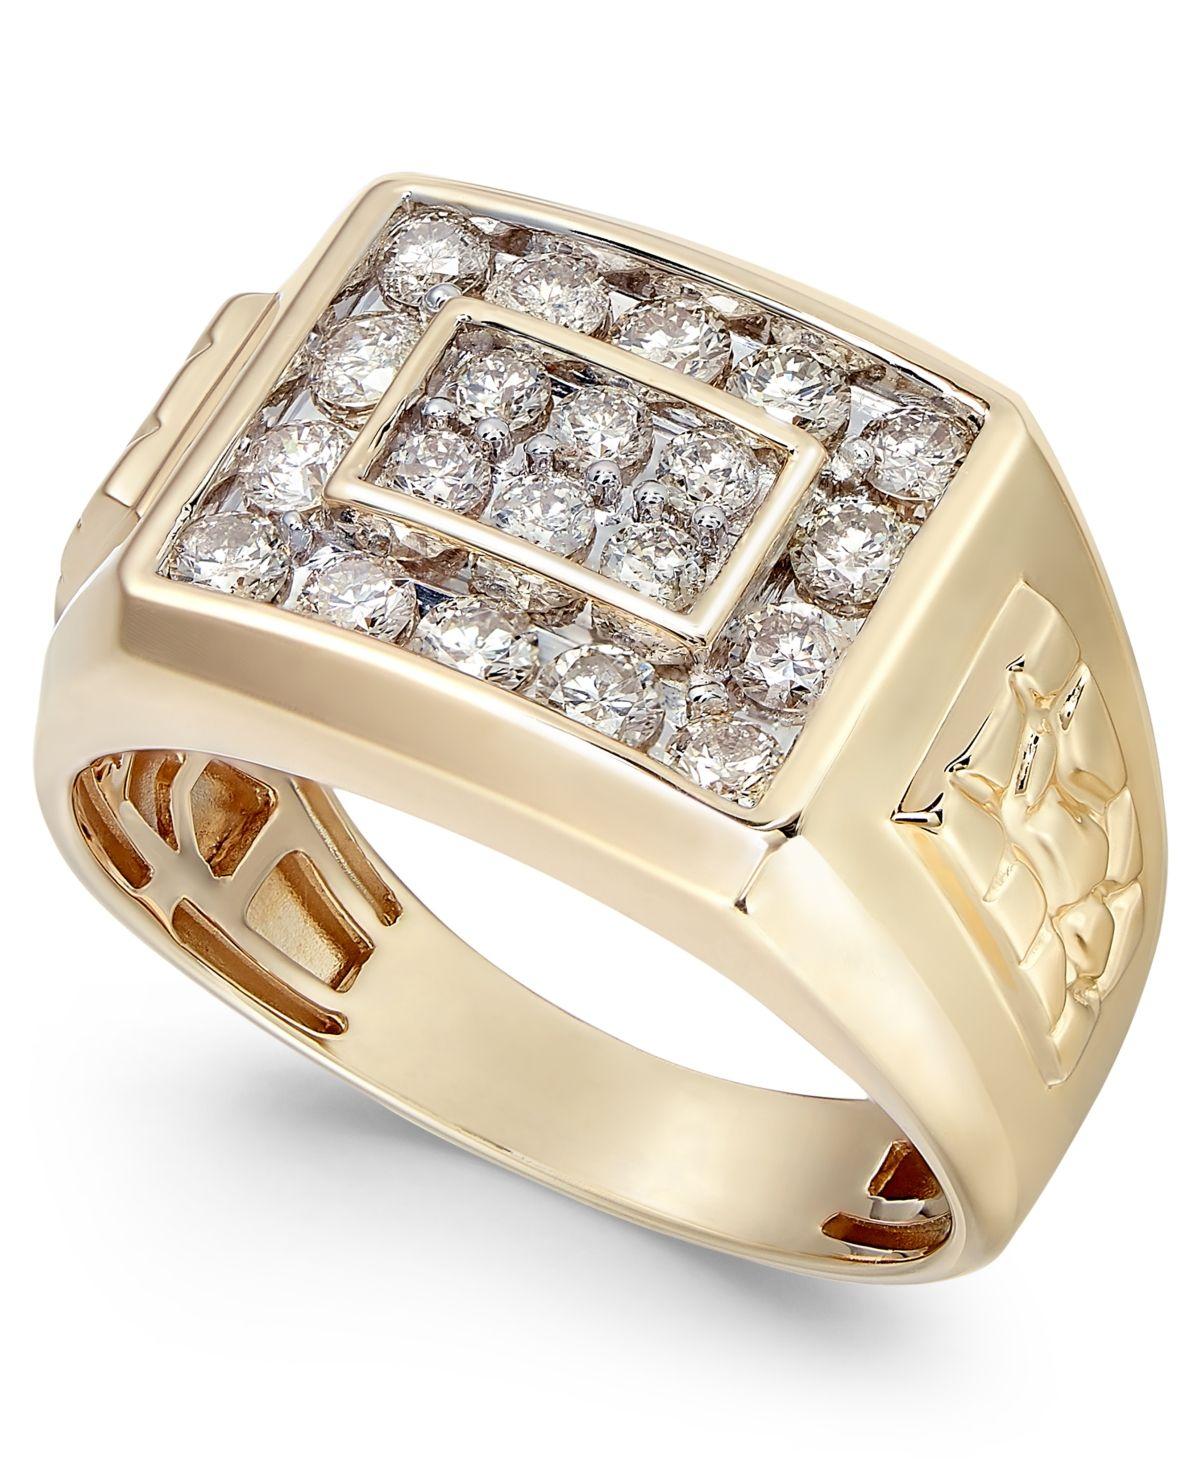 Macy's Men's Diamond Cluster Nugget Detail Ring (1 ct. t.w